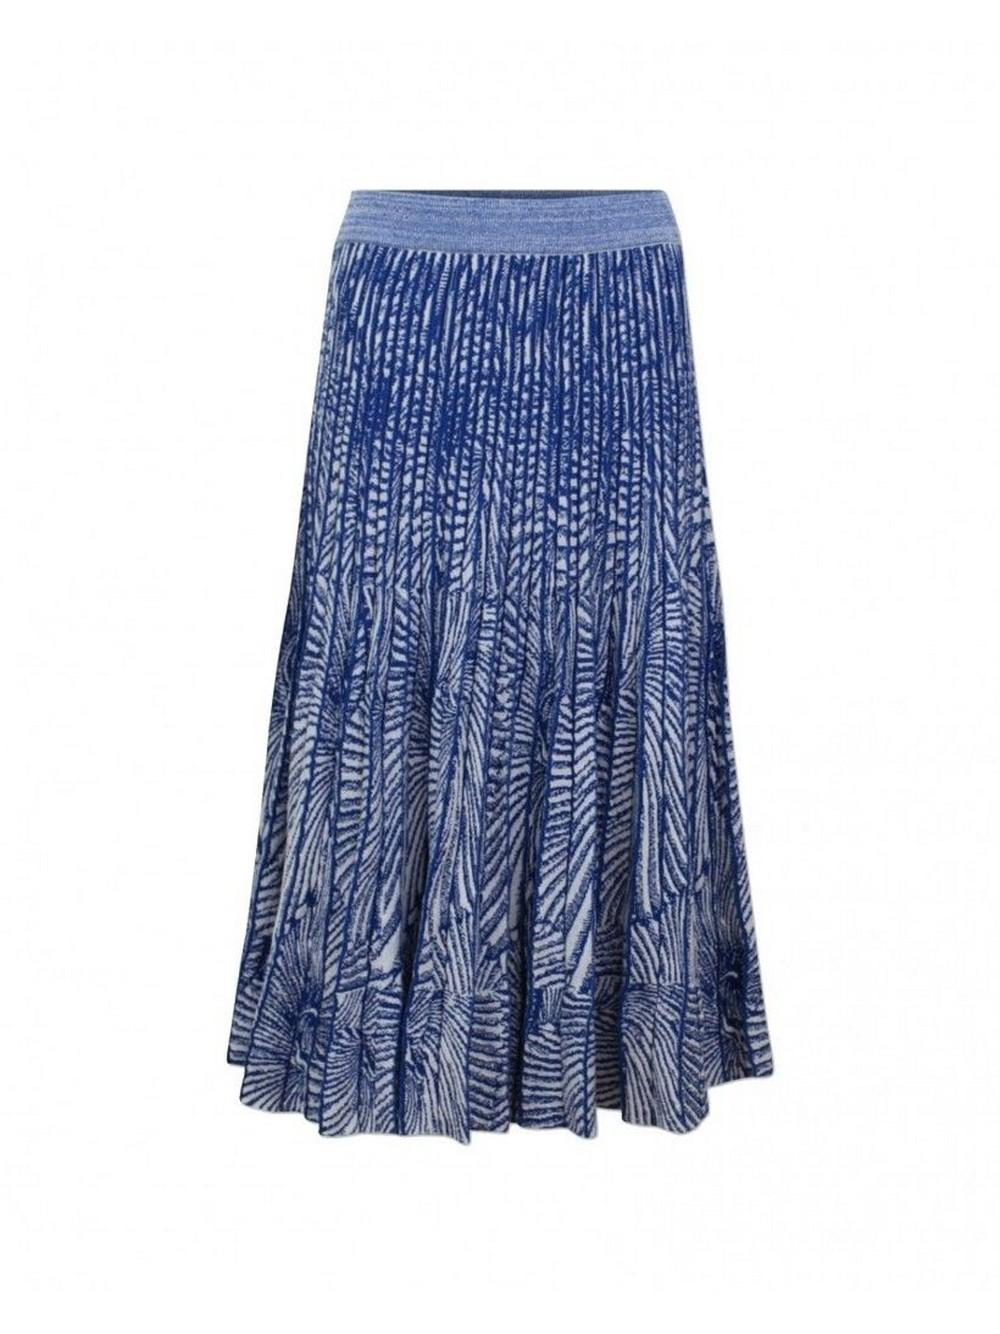 Cyrilla Shell Print Knit Midi Skirt